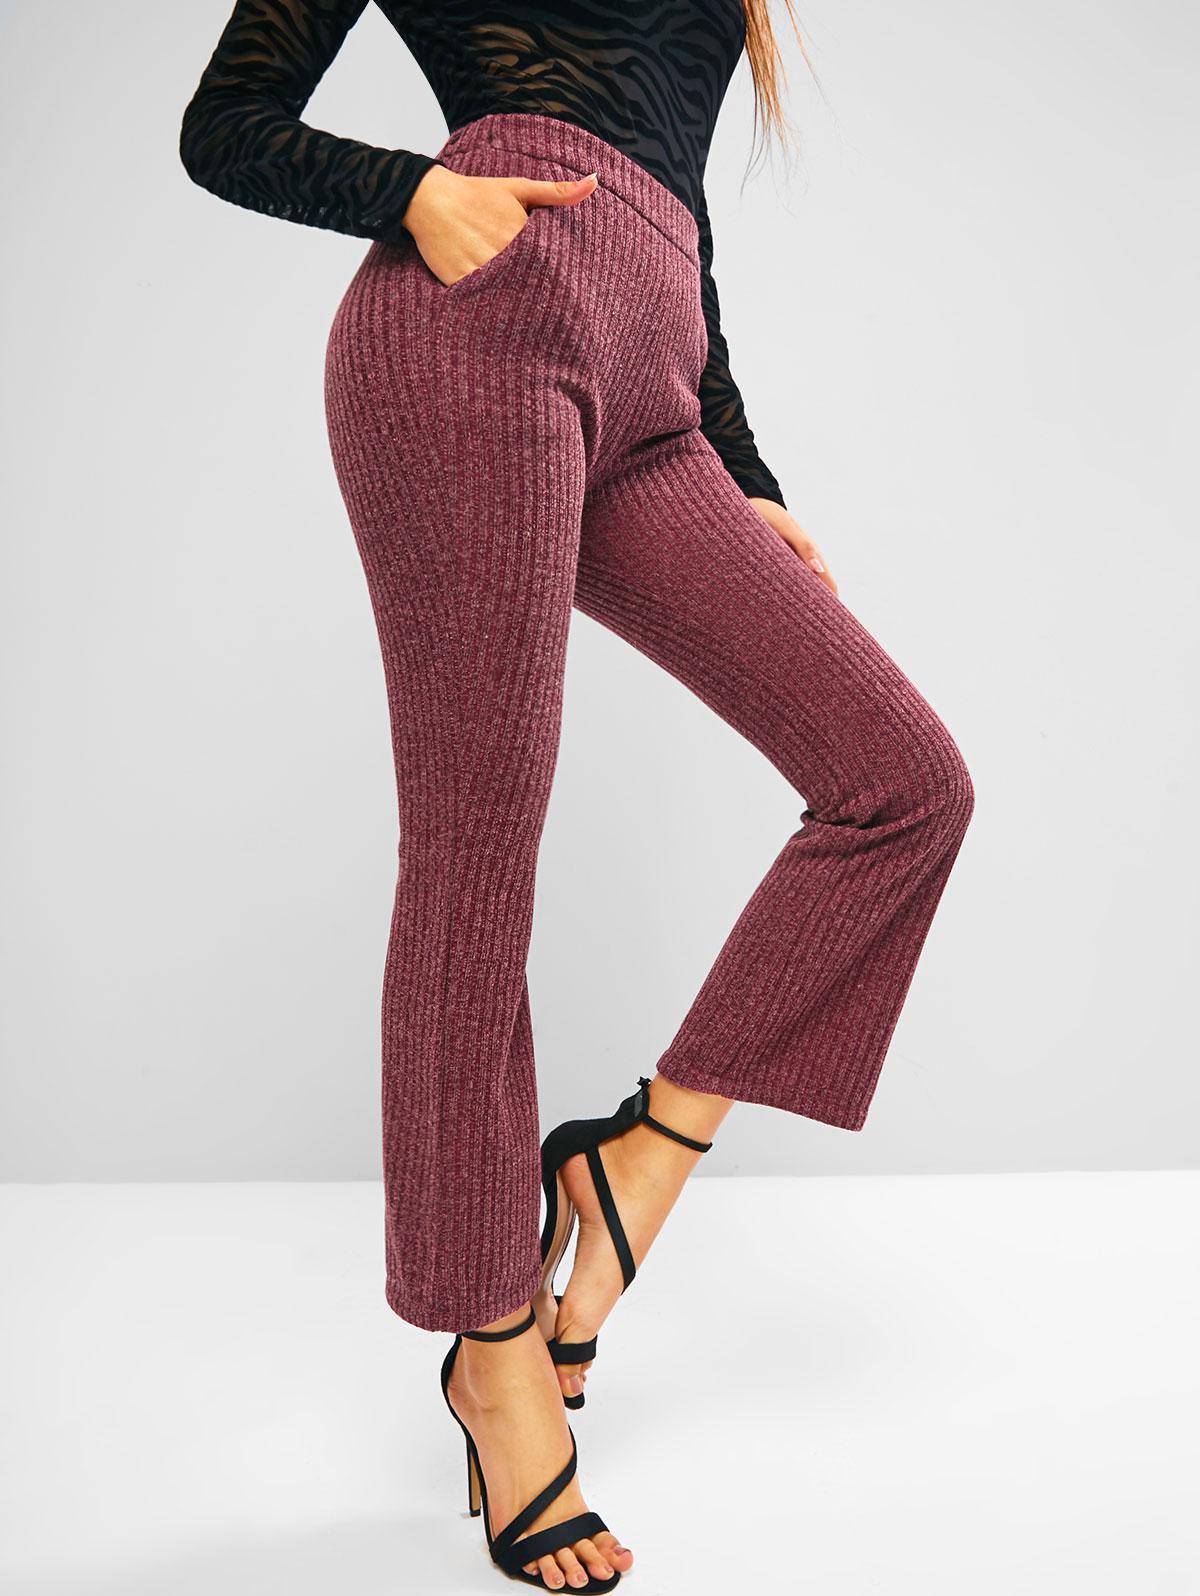 Pantalon Bootcut en Tricot à Taille Haute avec Poche L - Zaful FR - Modalova